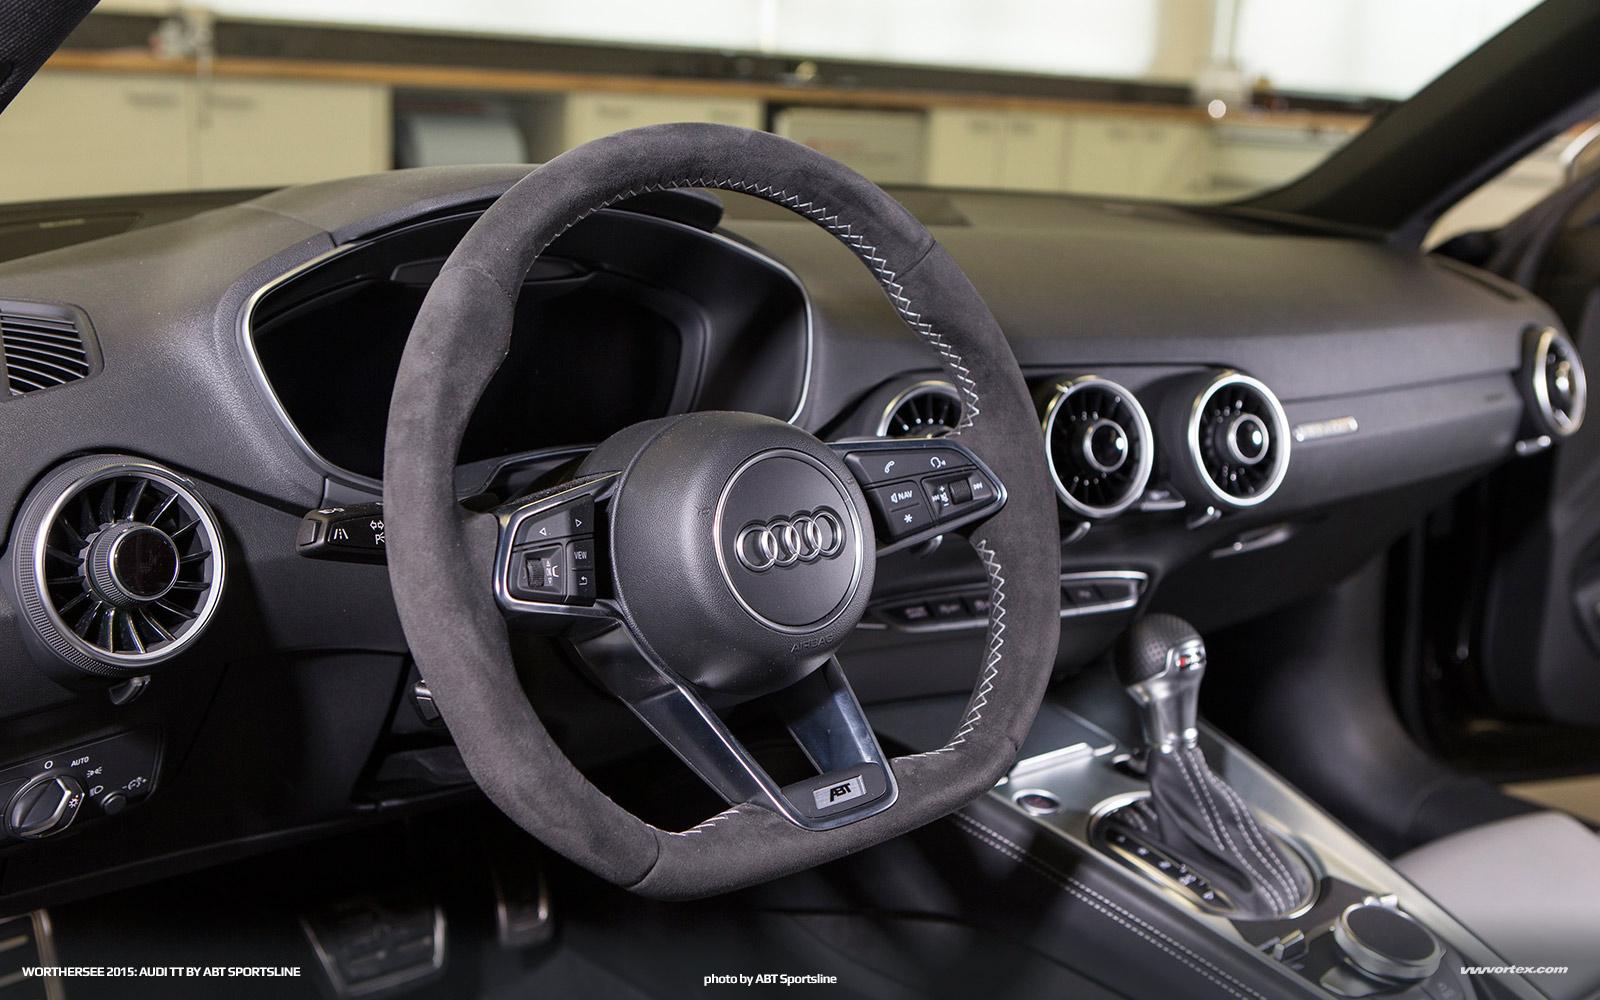 4e7a45e29 Oris Introduces Audi Sport Limited Edition II Chronograph for 2015 ...